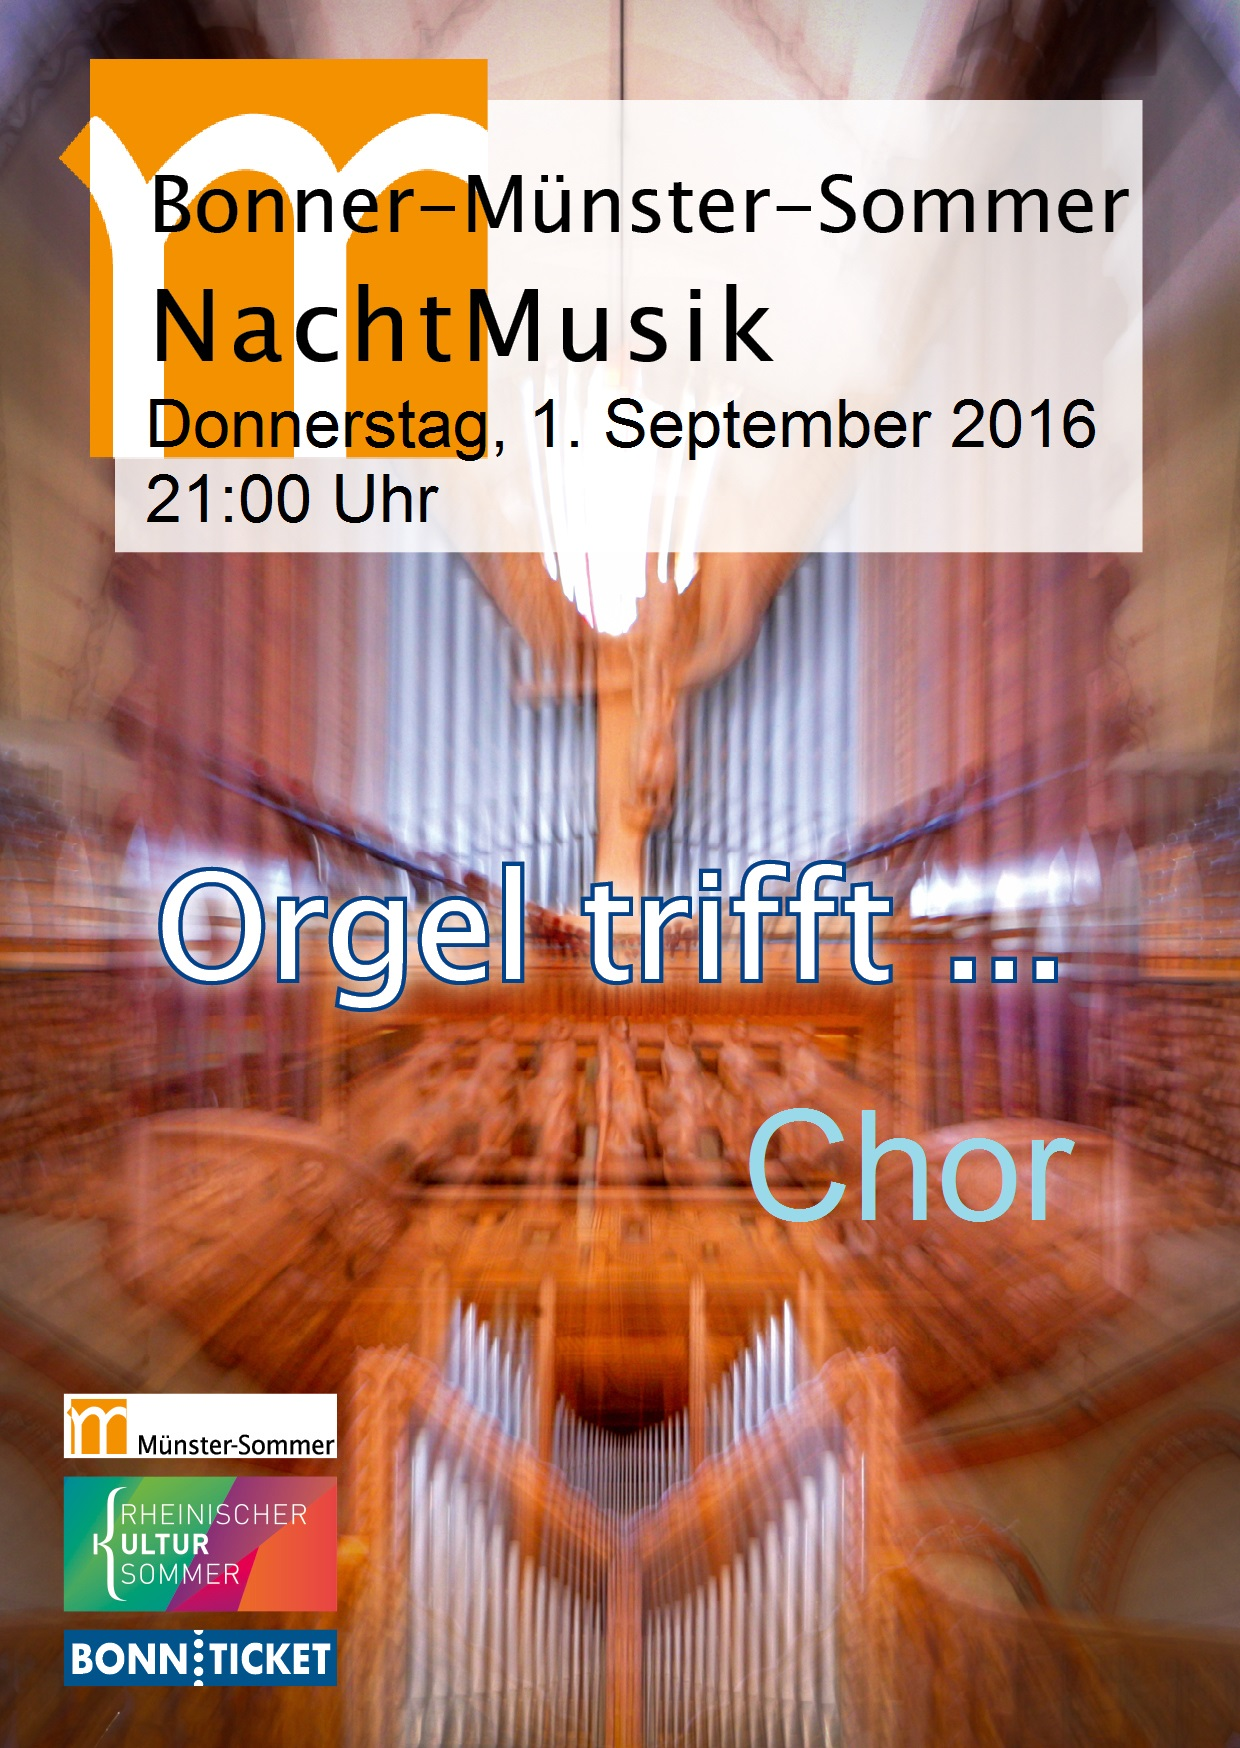 20160109 NachtMusik Orgel trifft Chor